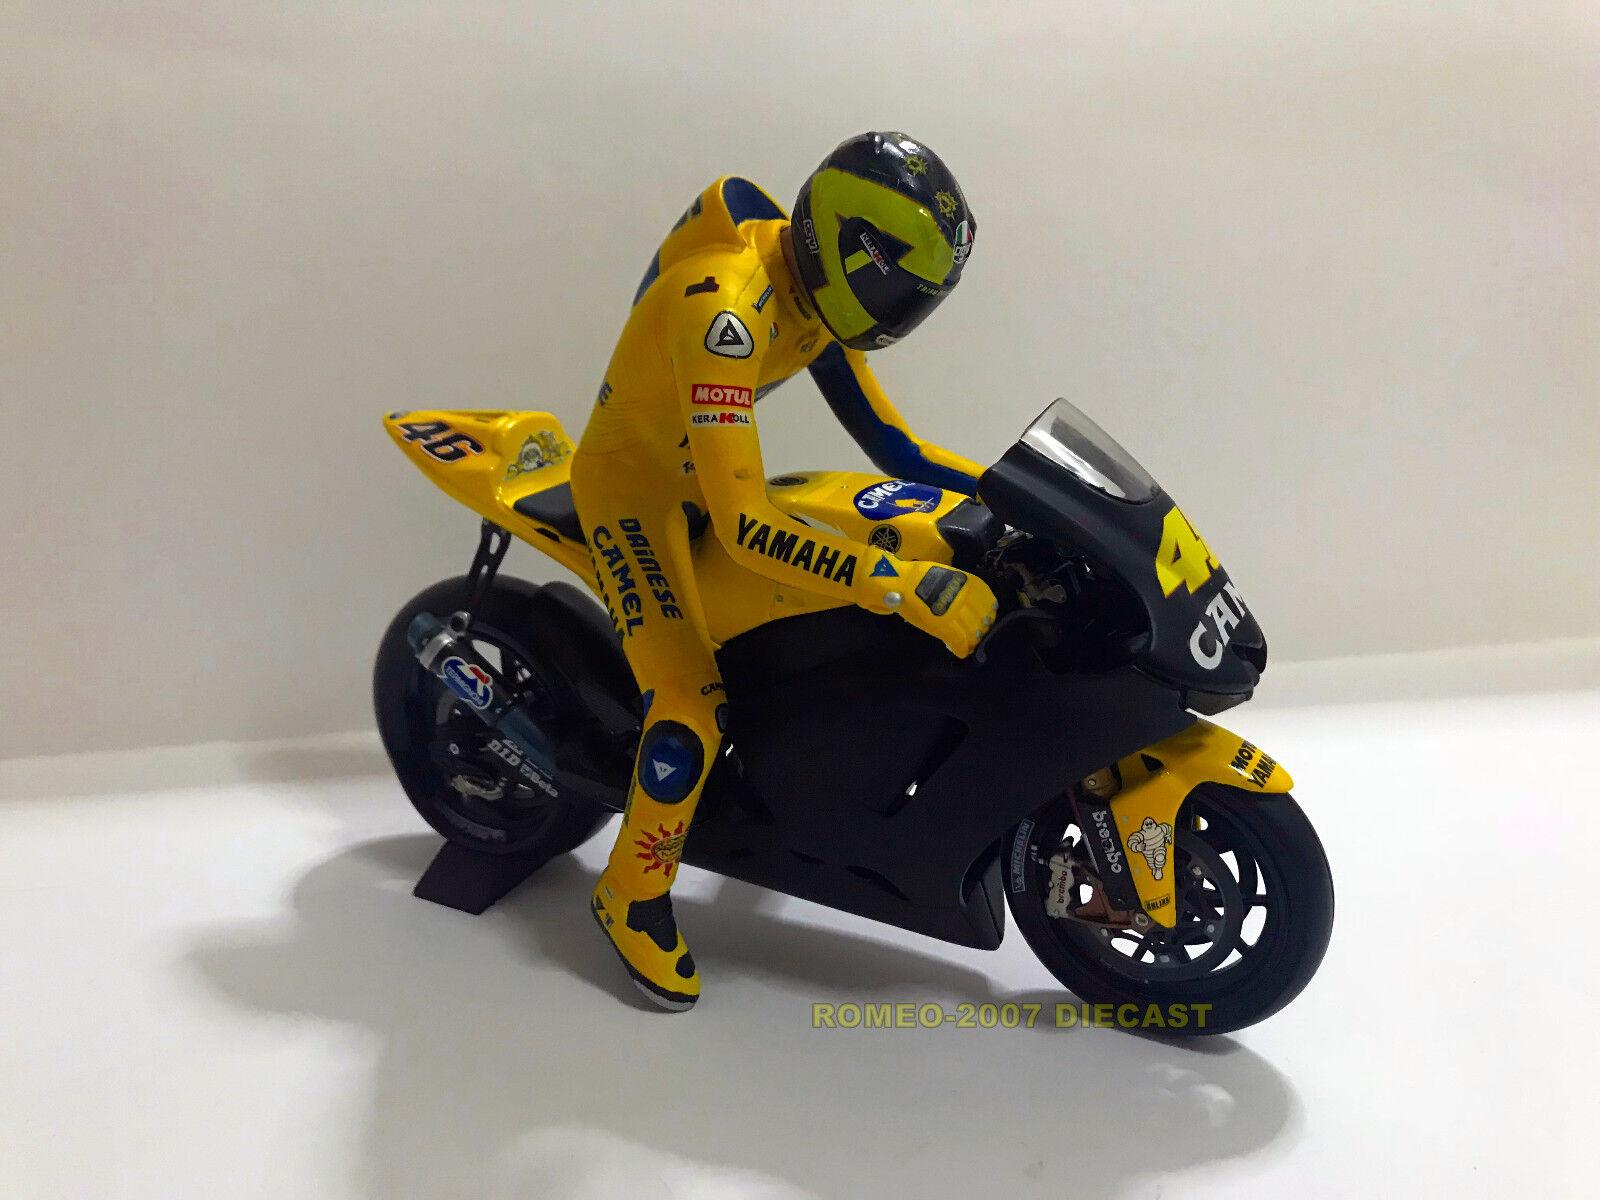 1 12 Conversión Minichamps Bike + Figure Figurine Valentino Rossi Test 2006